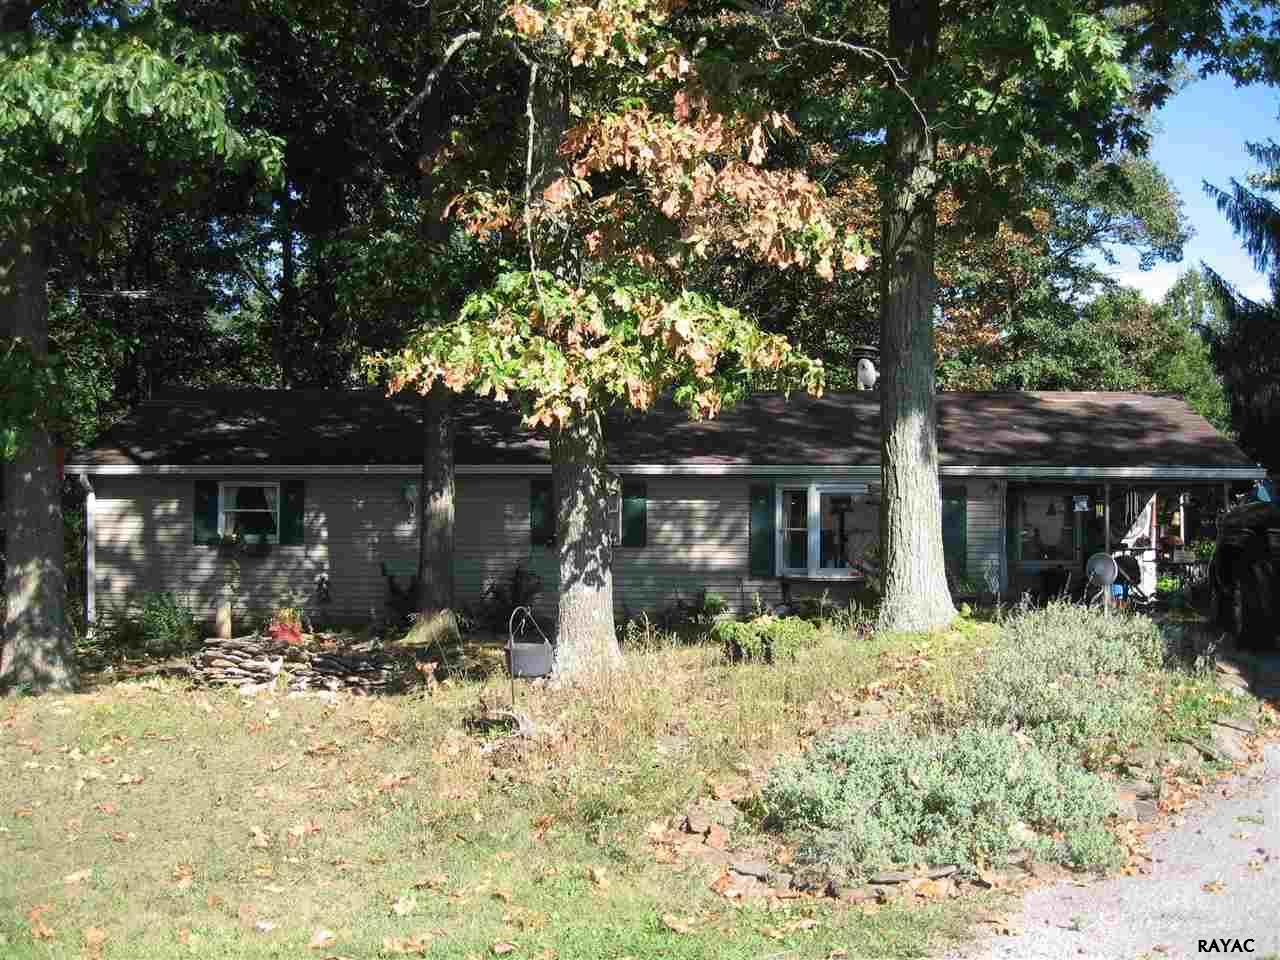 16421 Edgar Woods Rd, New Park, PA 17352